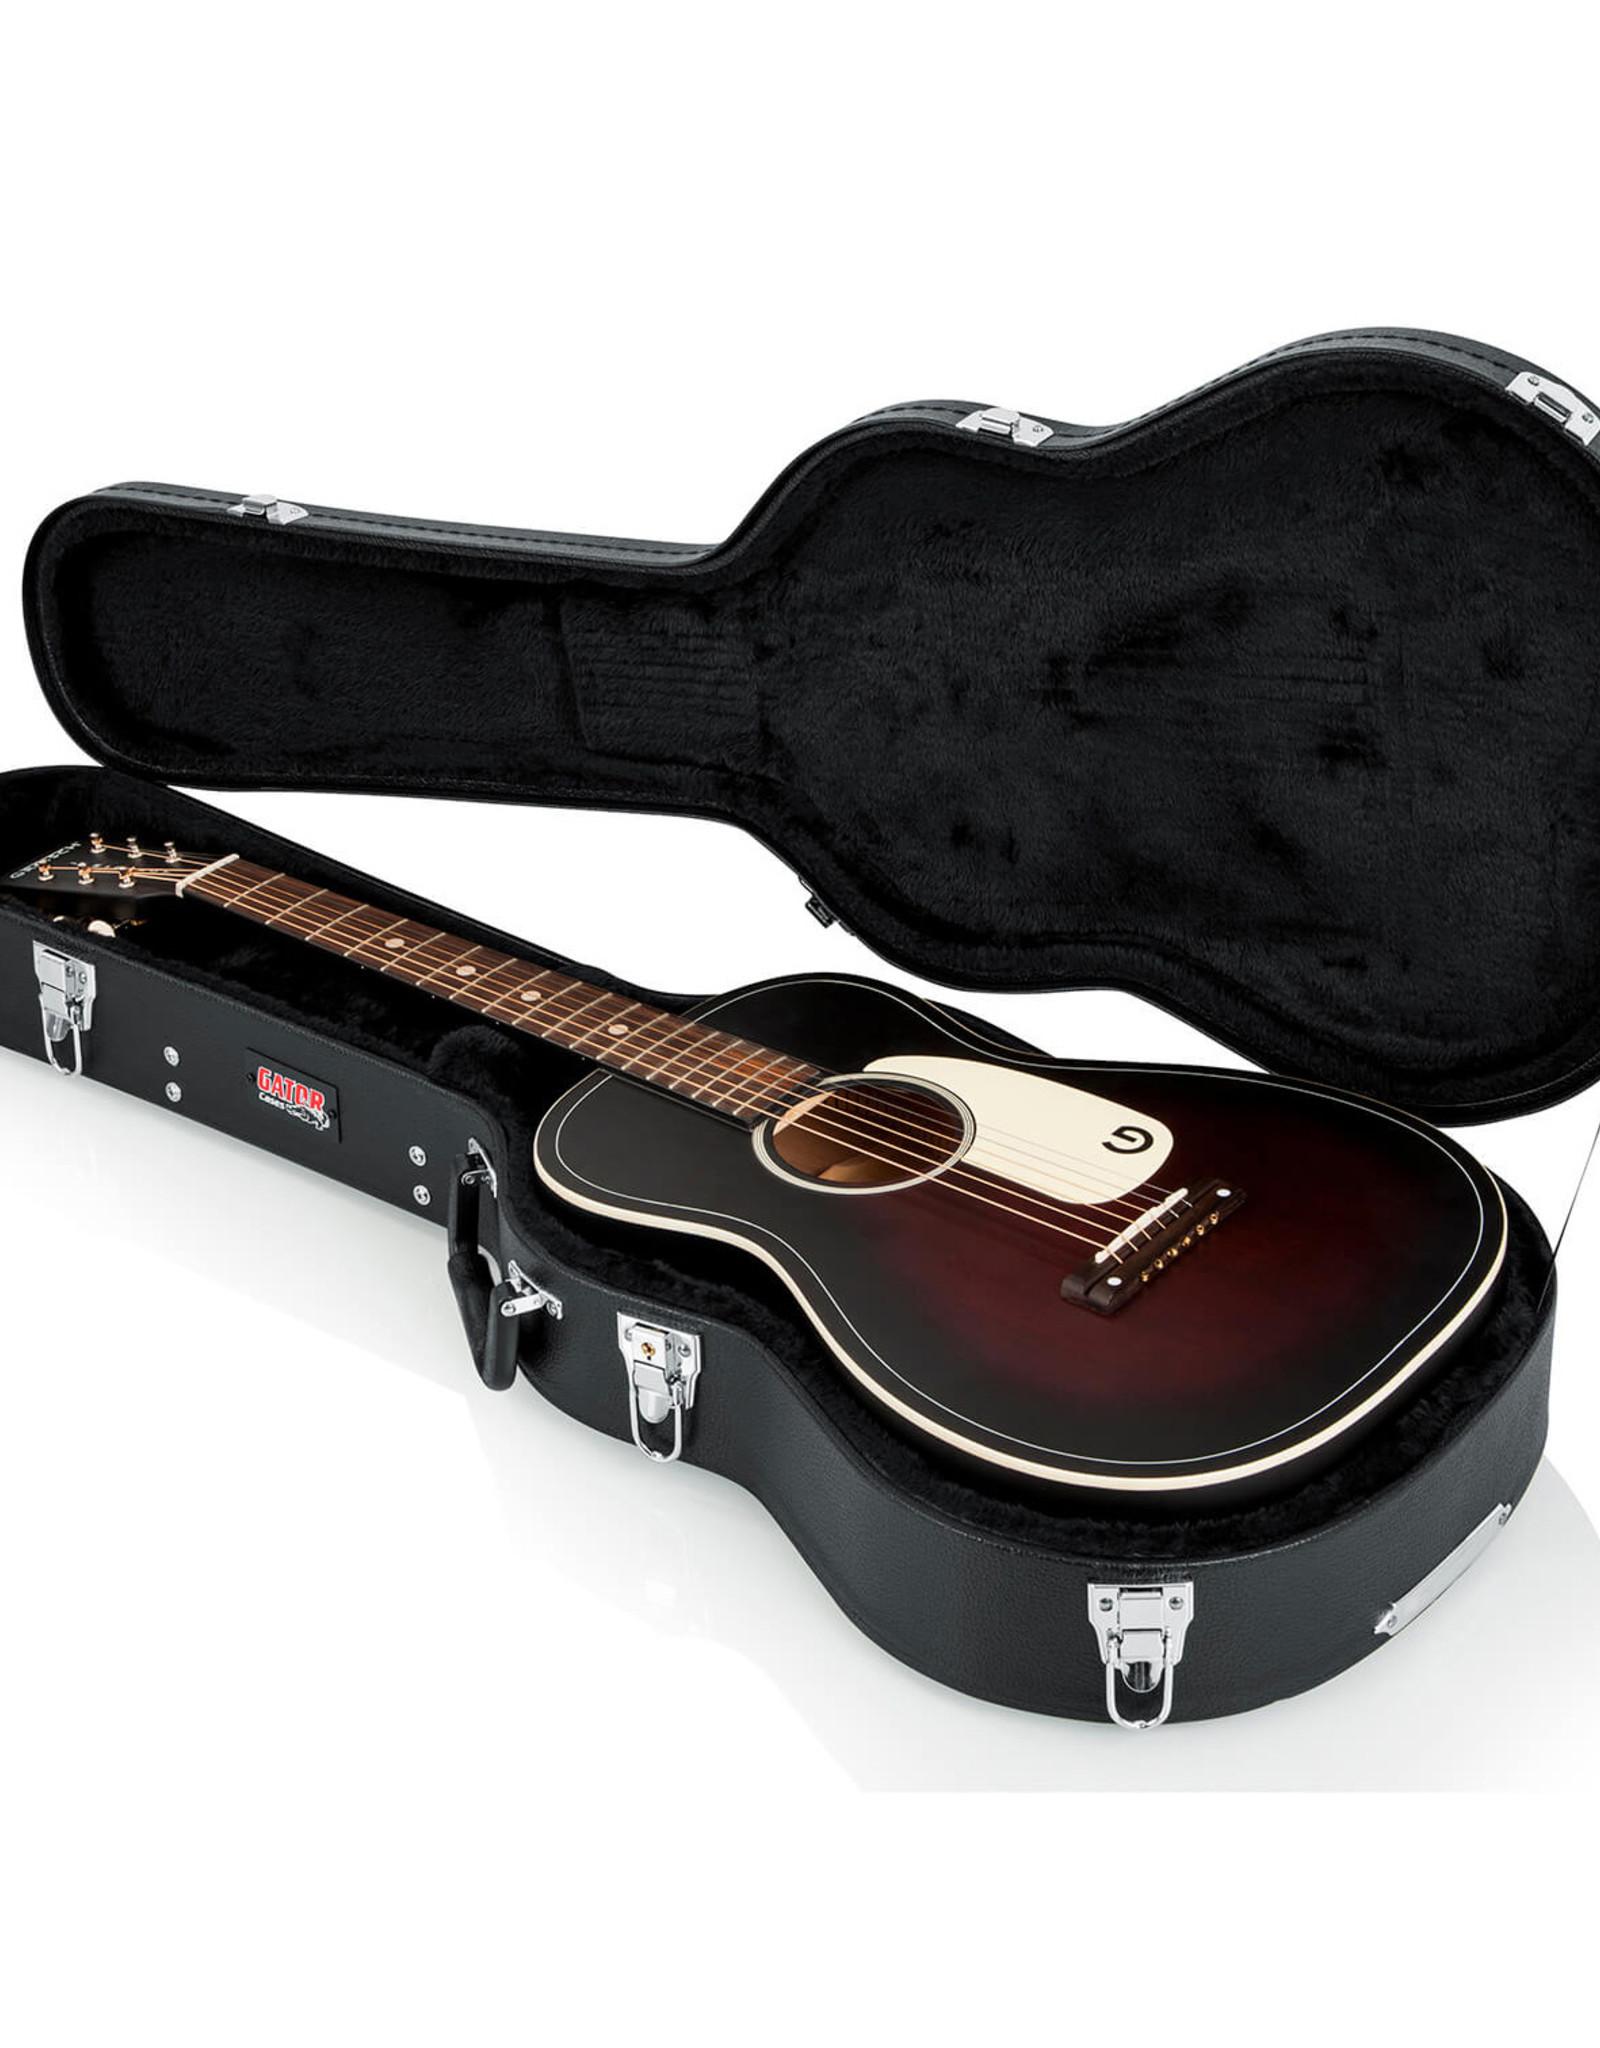 Gator Gator Hard-Shell Wood Case for 3/4-Size Acoustic Guitars